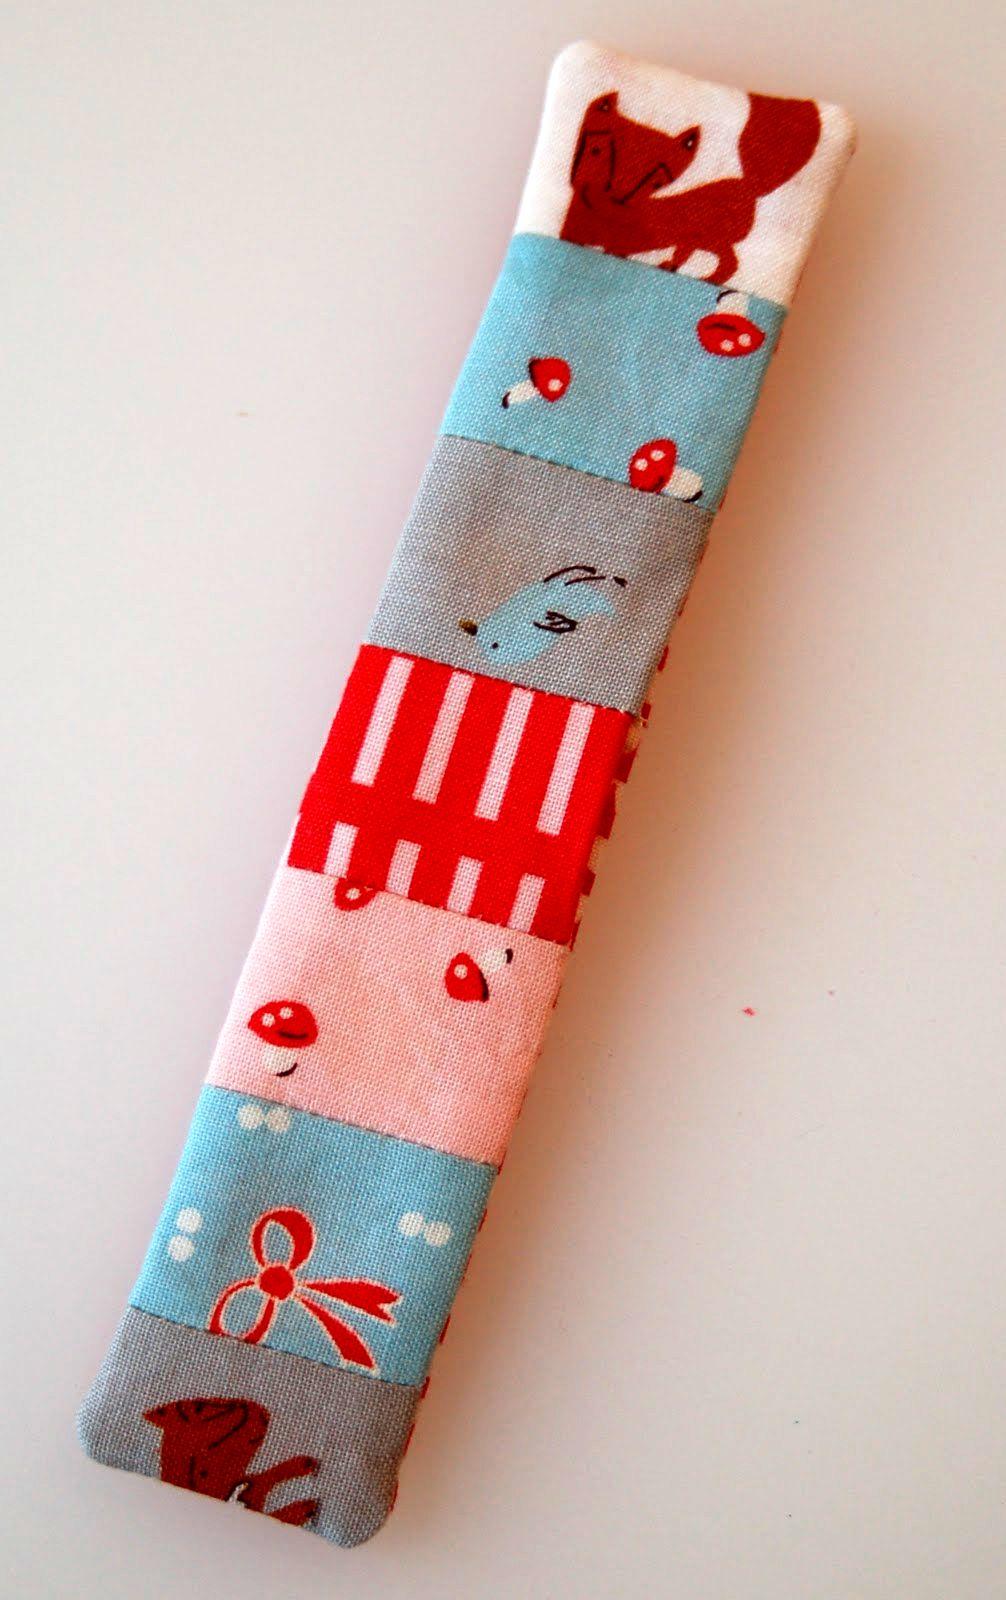 Fabric Cuff Bracelet Tutorial